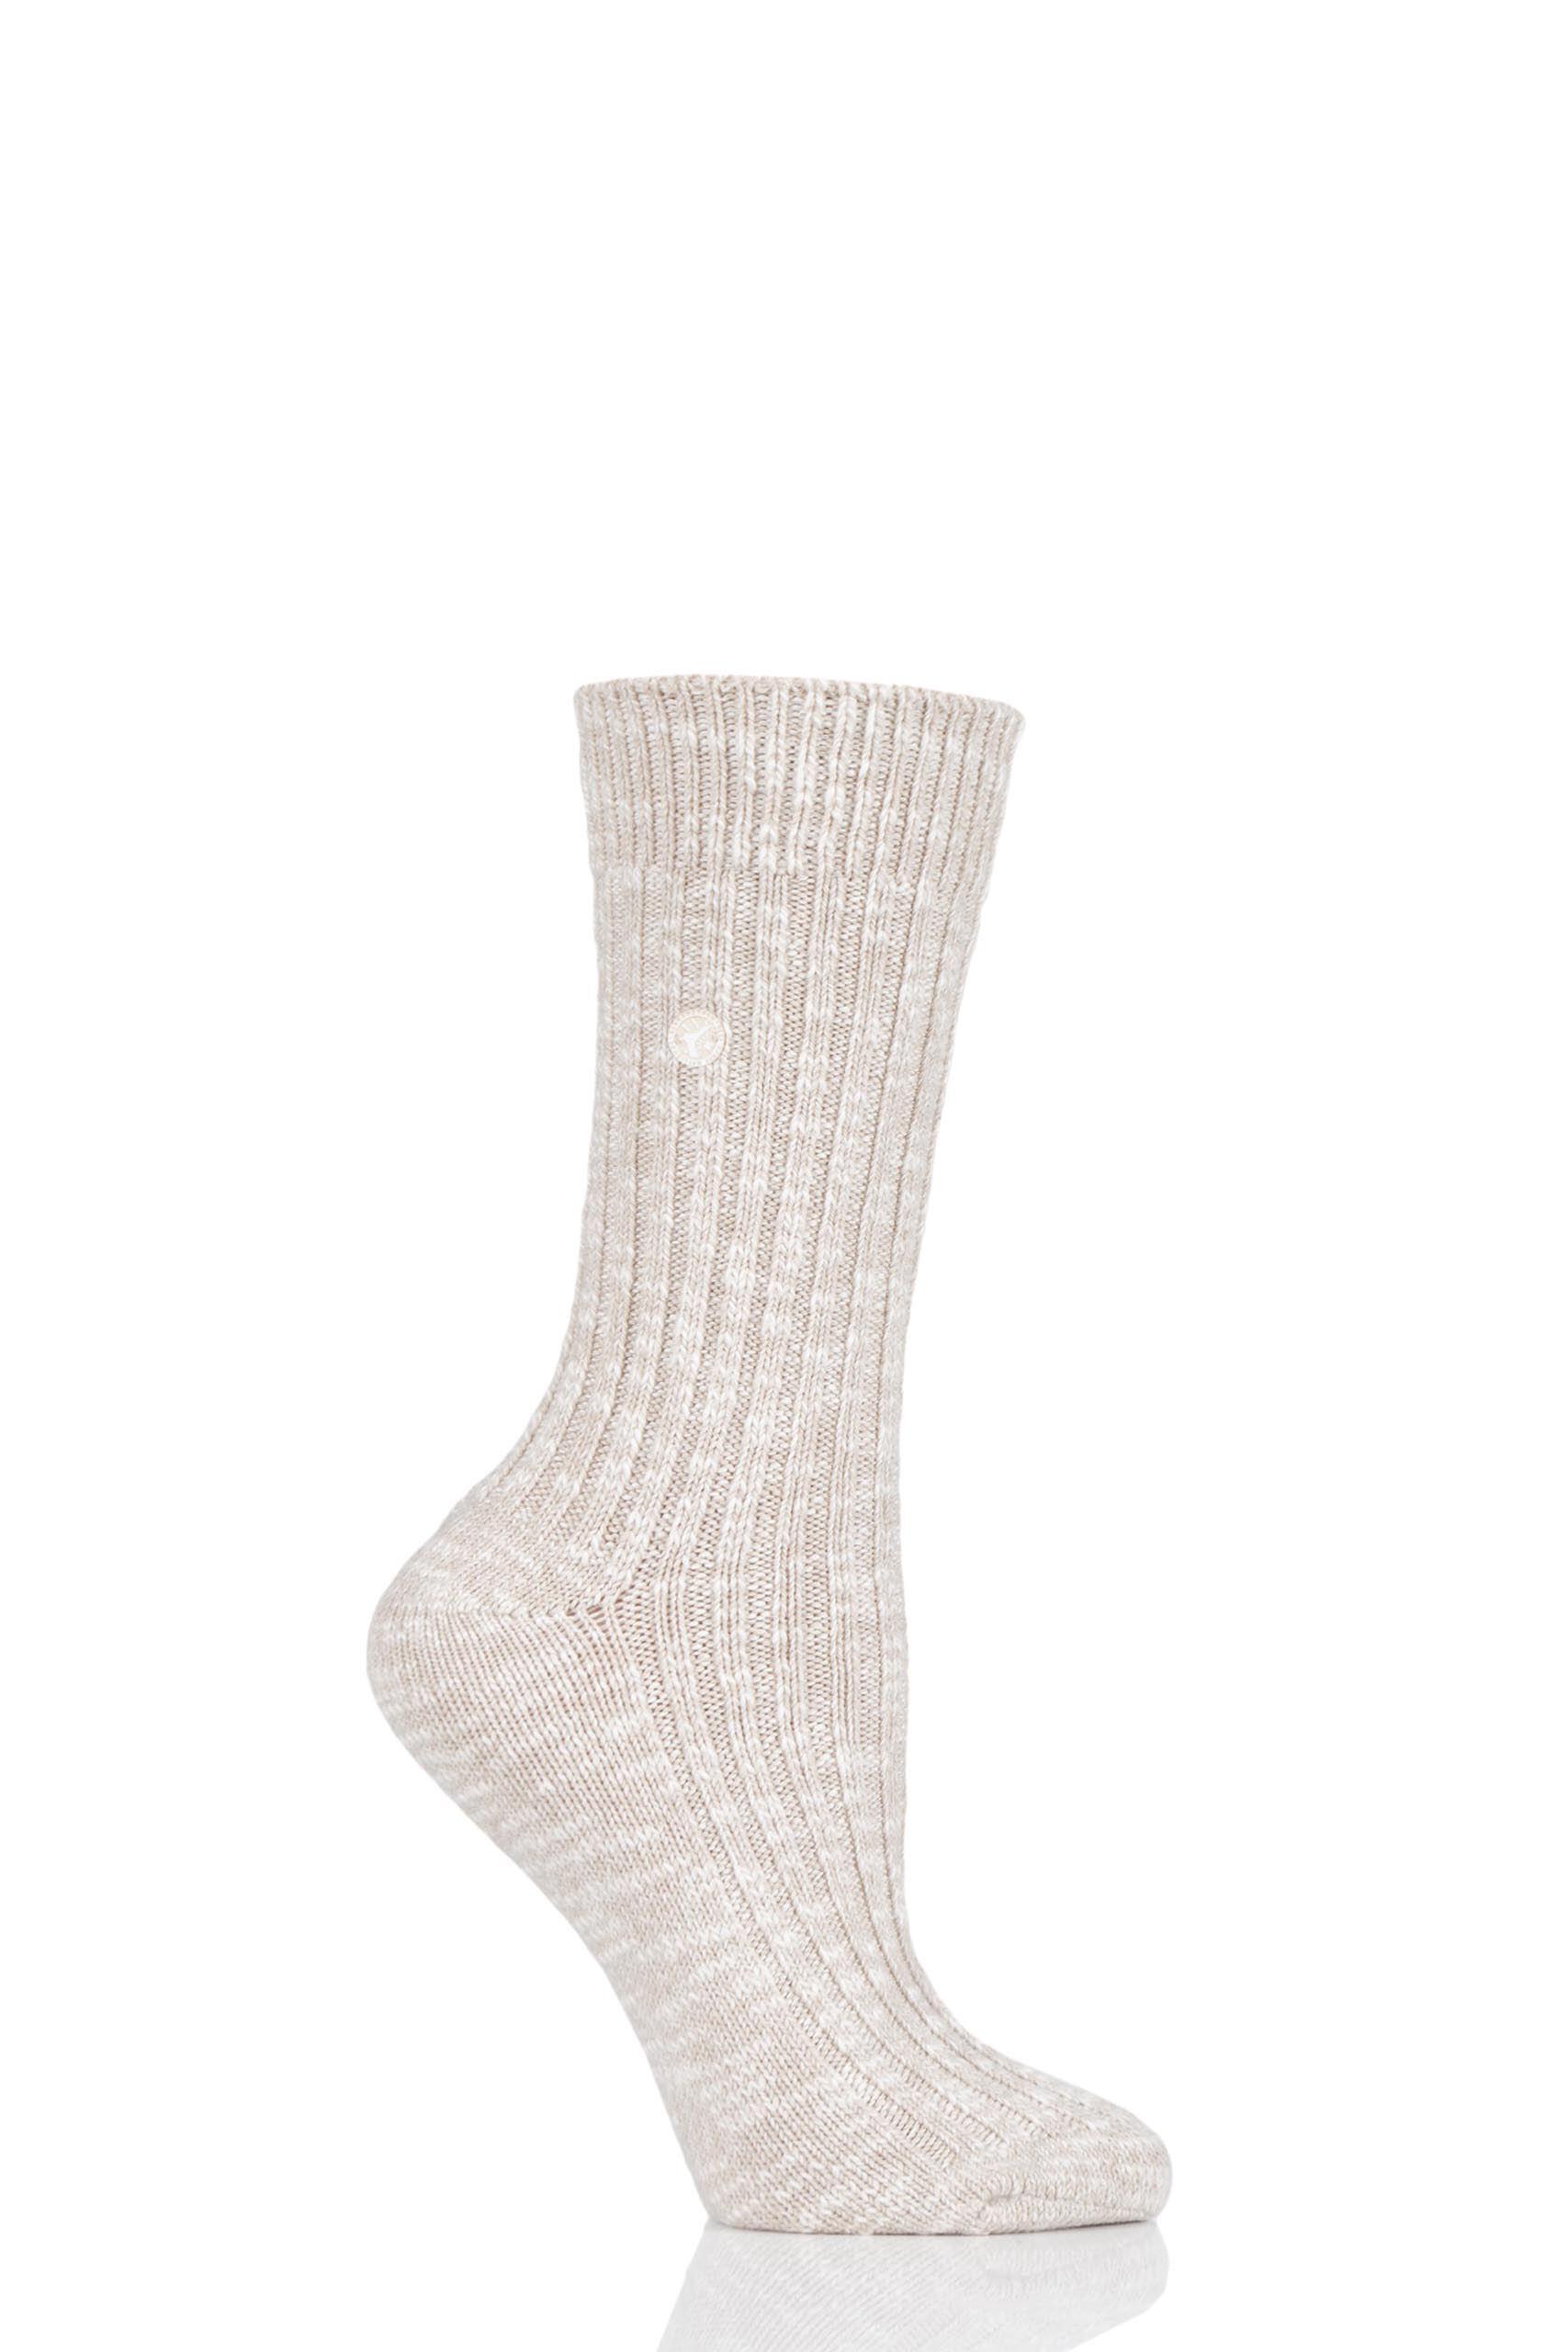 Image of 1 Pair Beige Cotton Slub Chunky Ribbed Socks Ladies 5.5-7.5 Ladies - Birkenstock